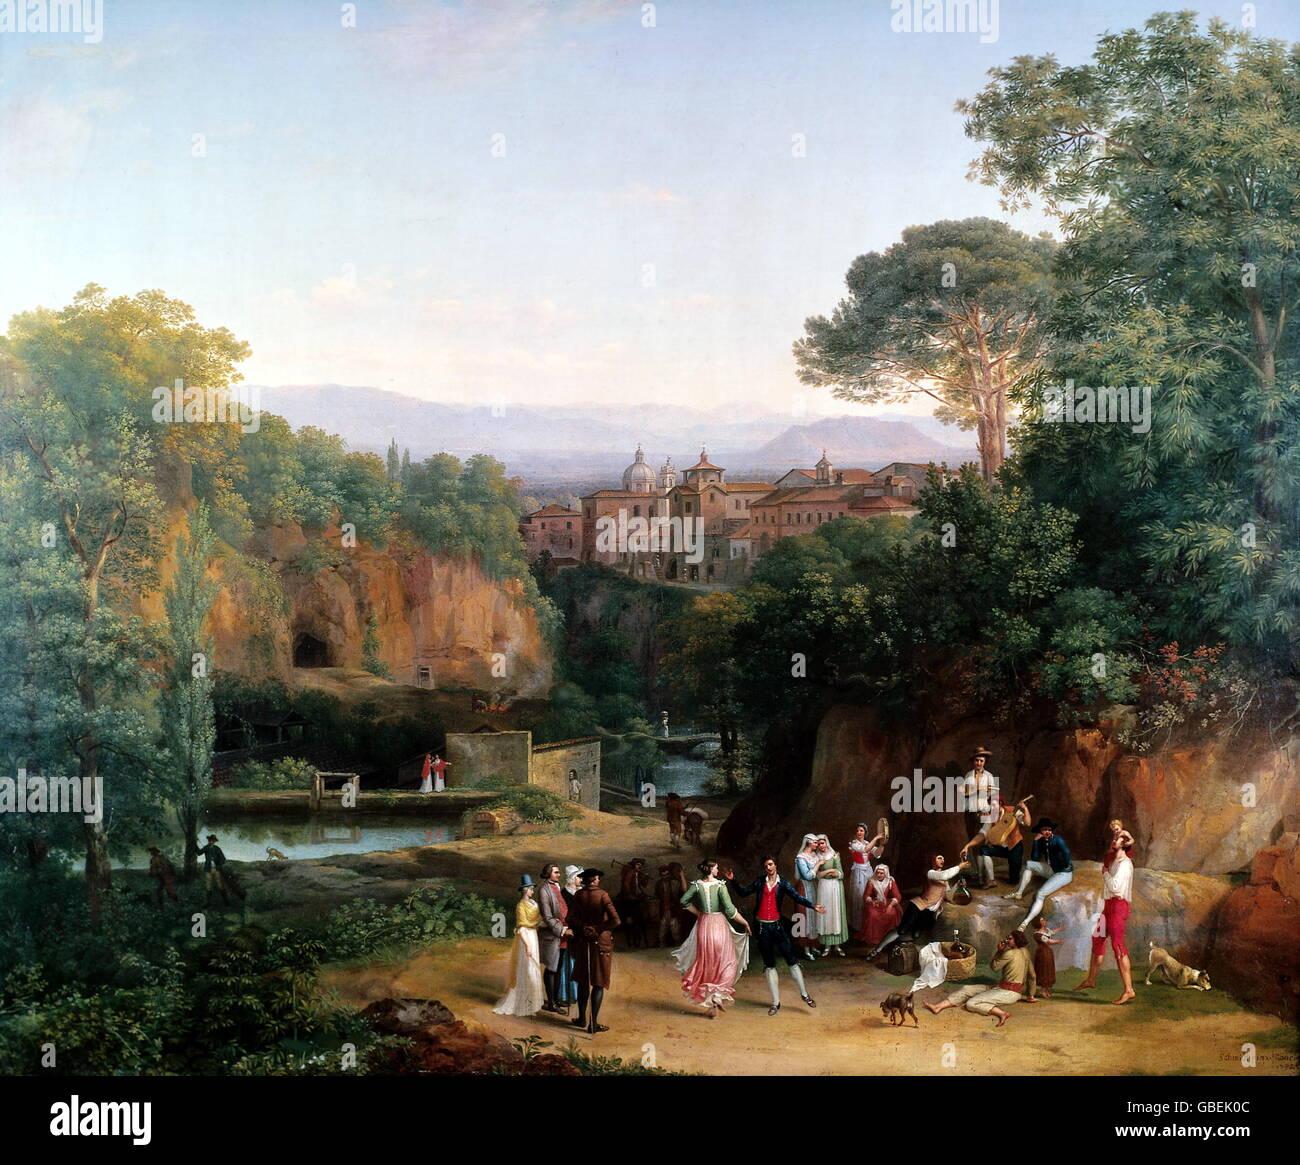 fine arts, Schmidt, Johann Heinrich (called Fornaro) (1741 - 1821), painting 'Tanz im Freien' (Italian Landscape), - Stock Image